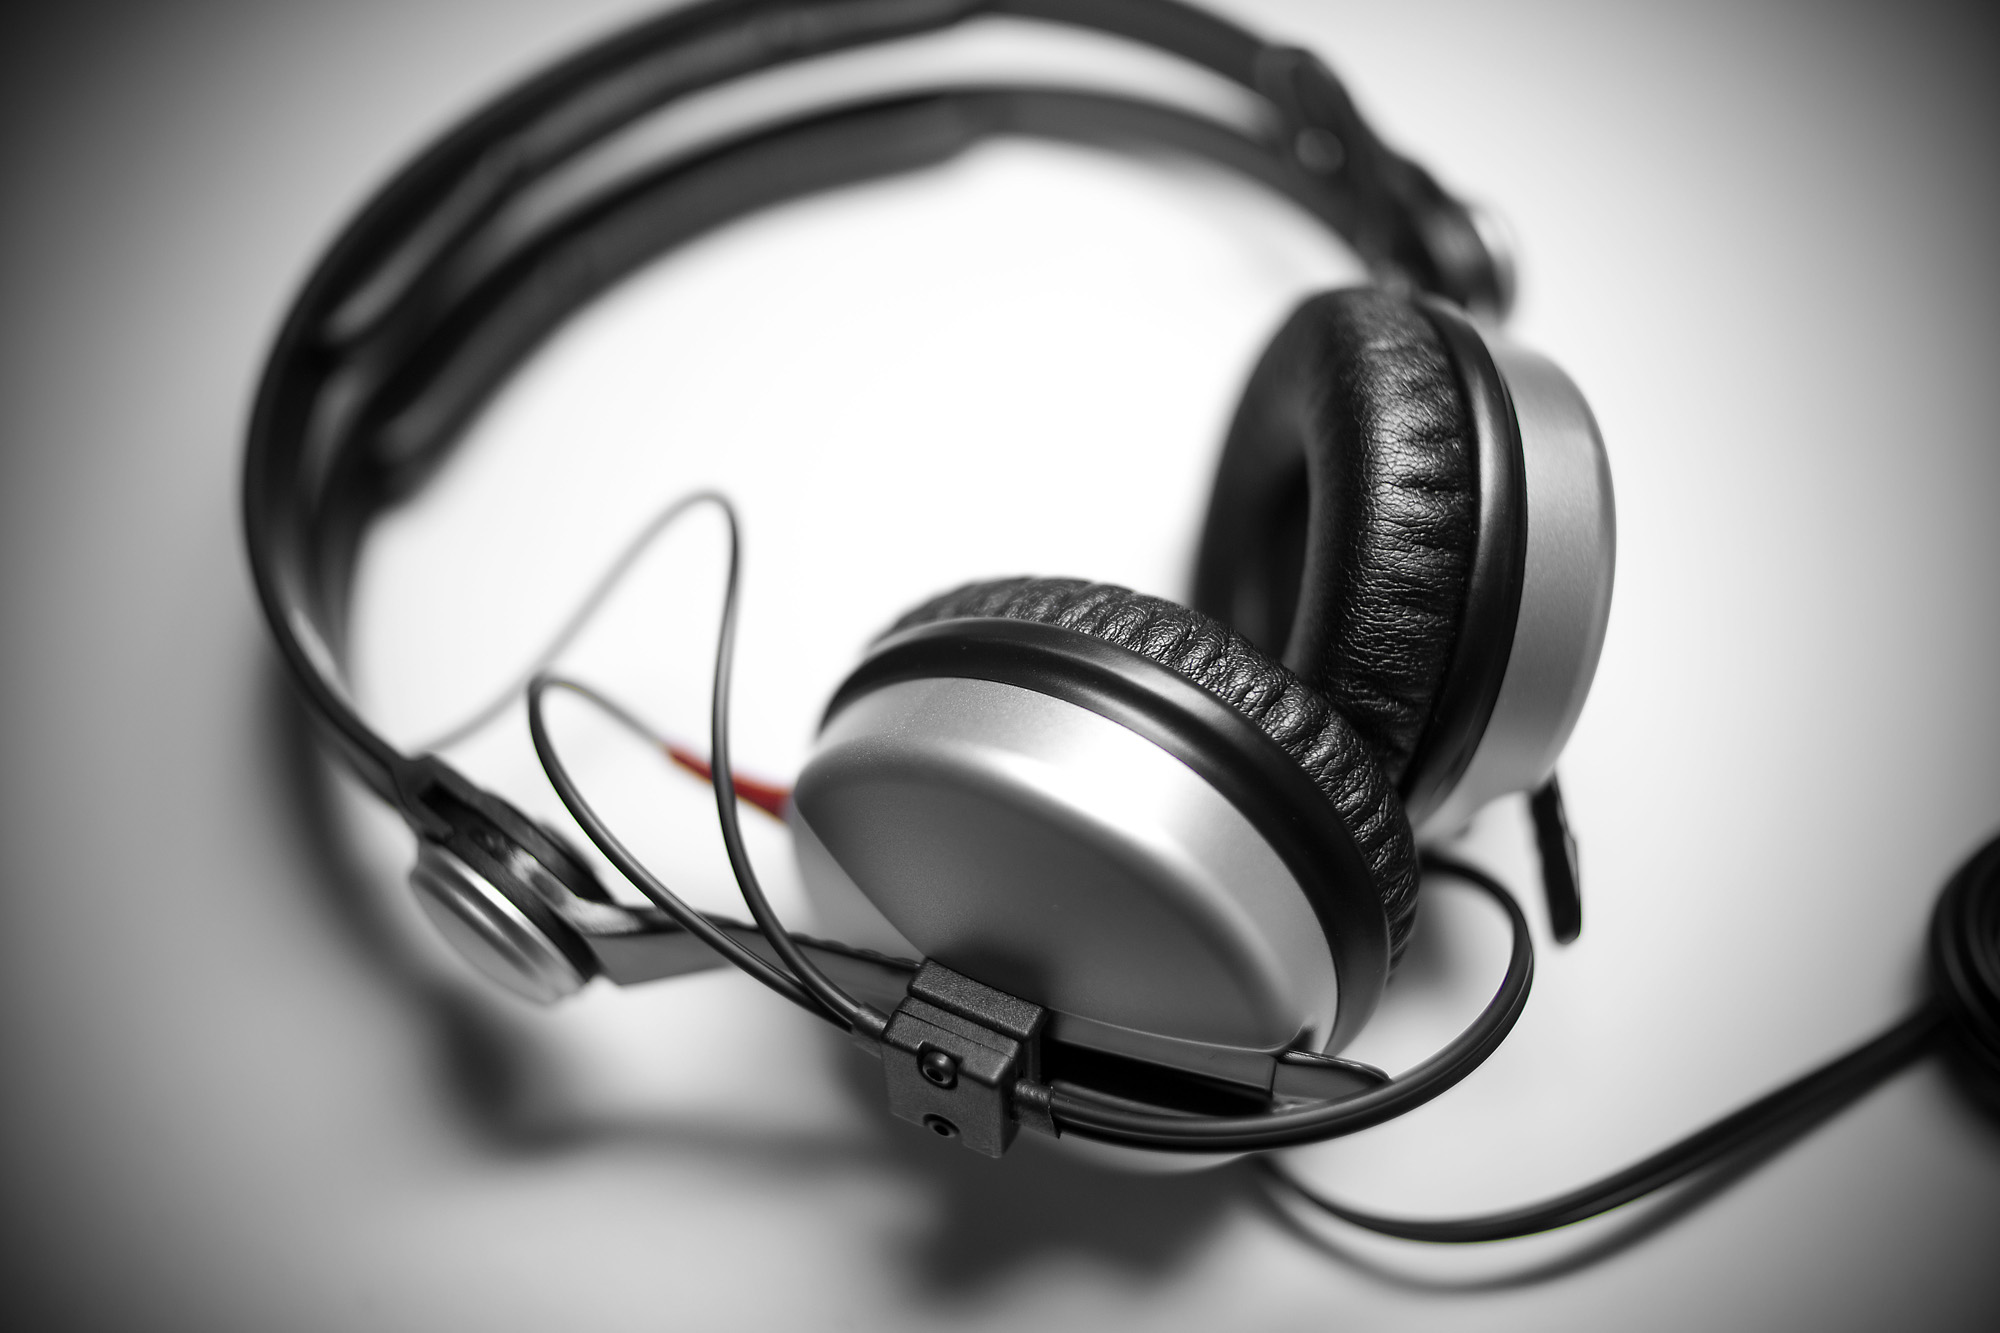 sennheiser hd 25 1 ii mind the headphone. Black Bedroom Furniture Sets. Home Design Ideas